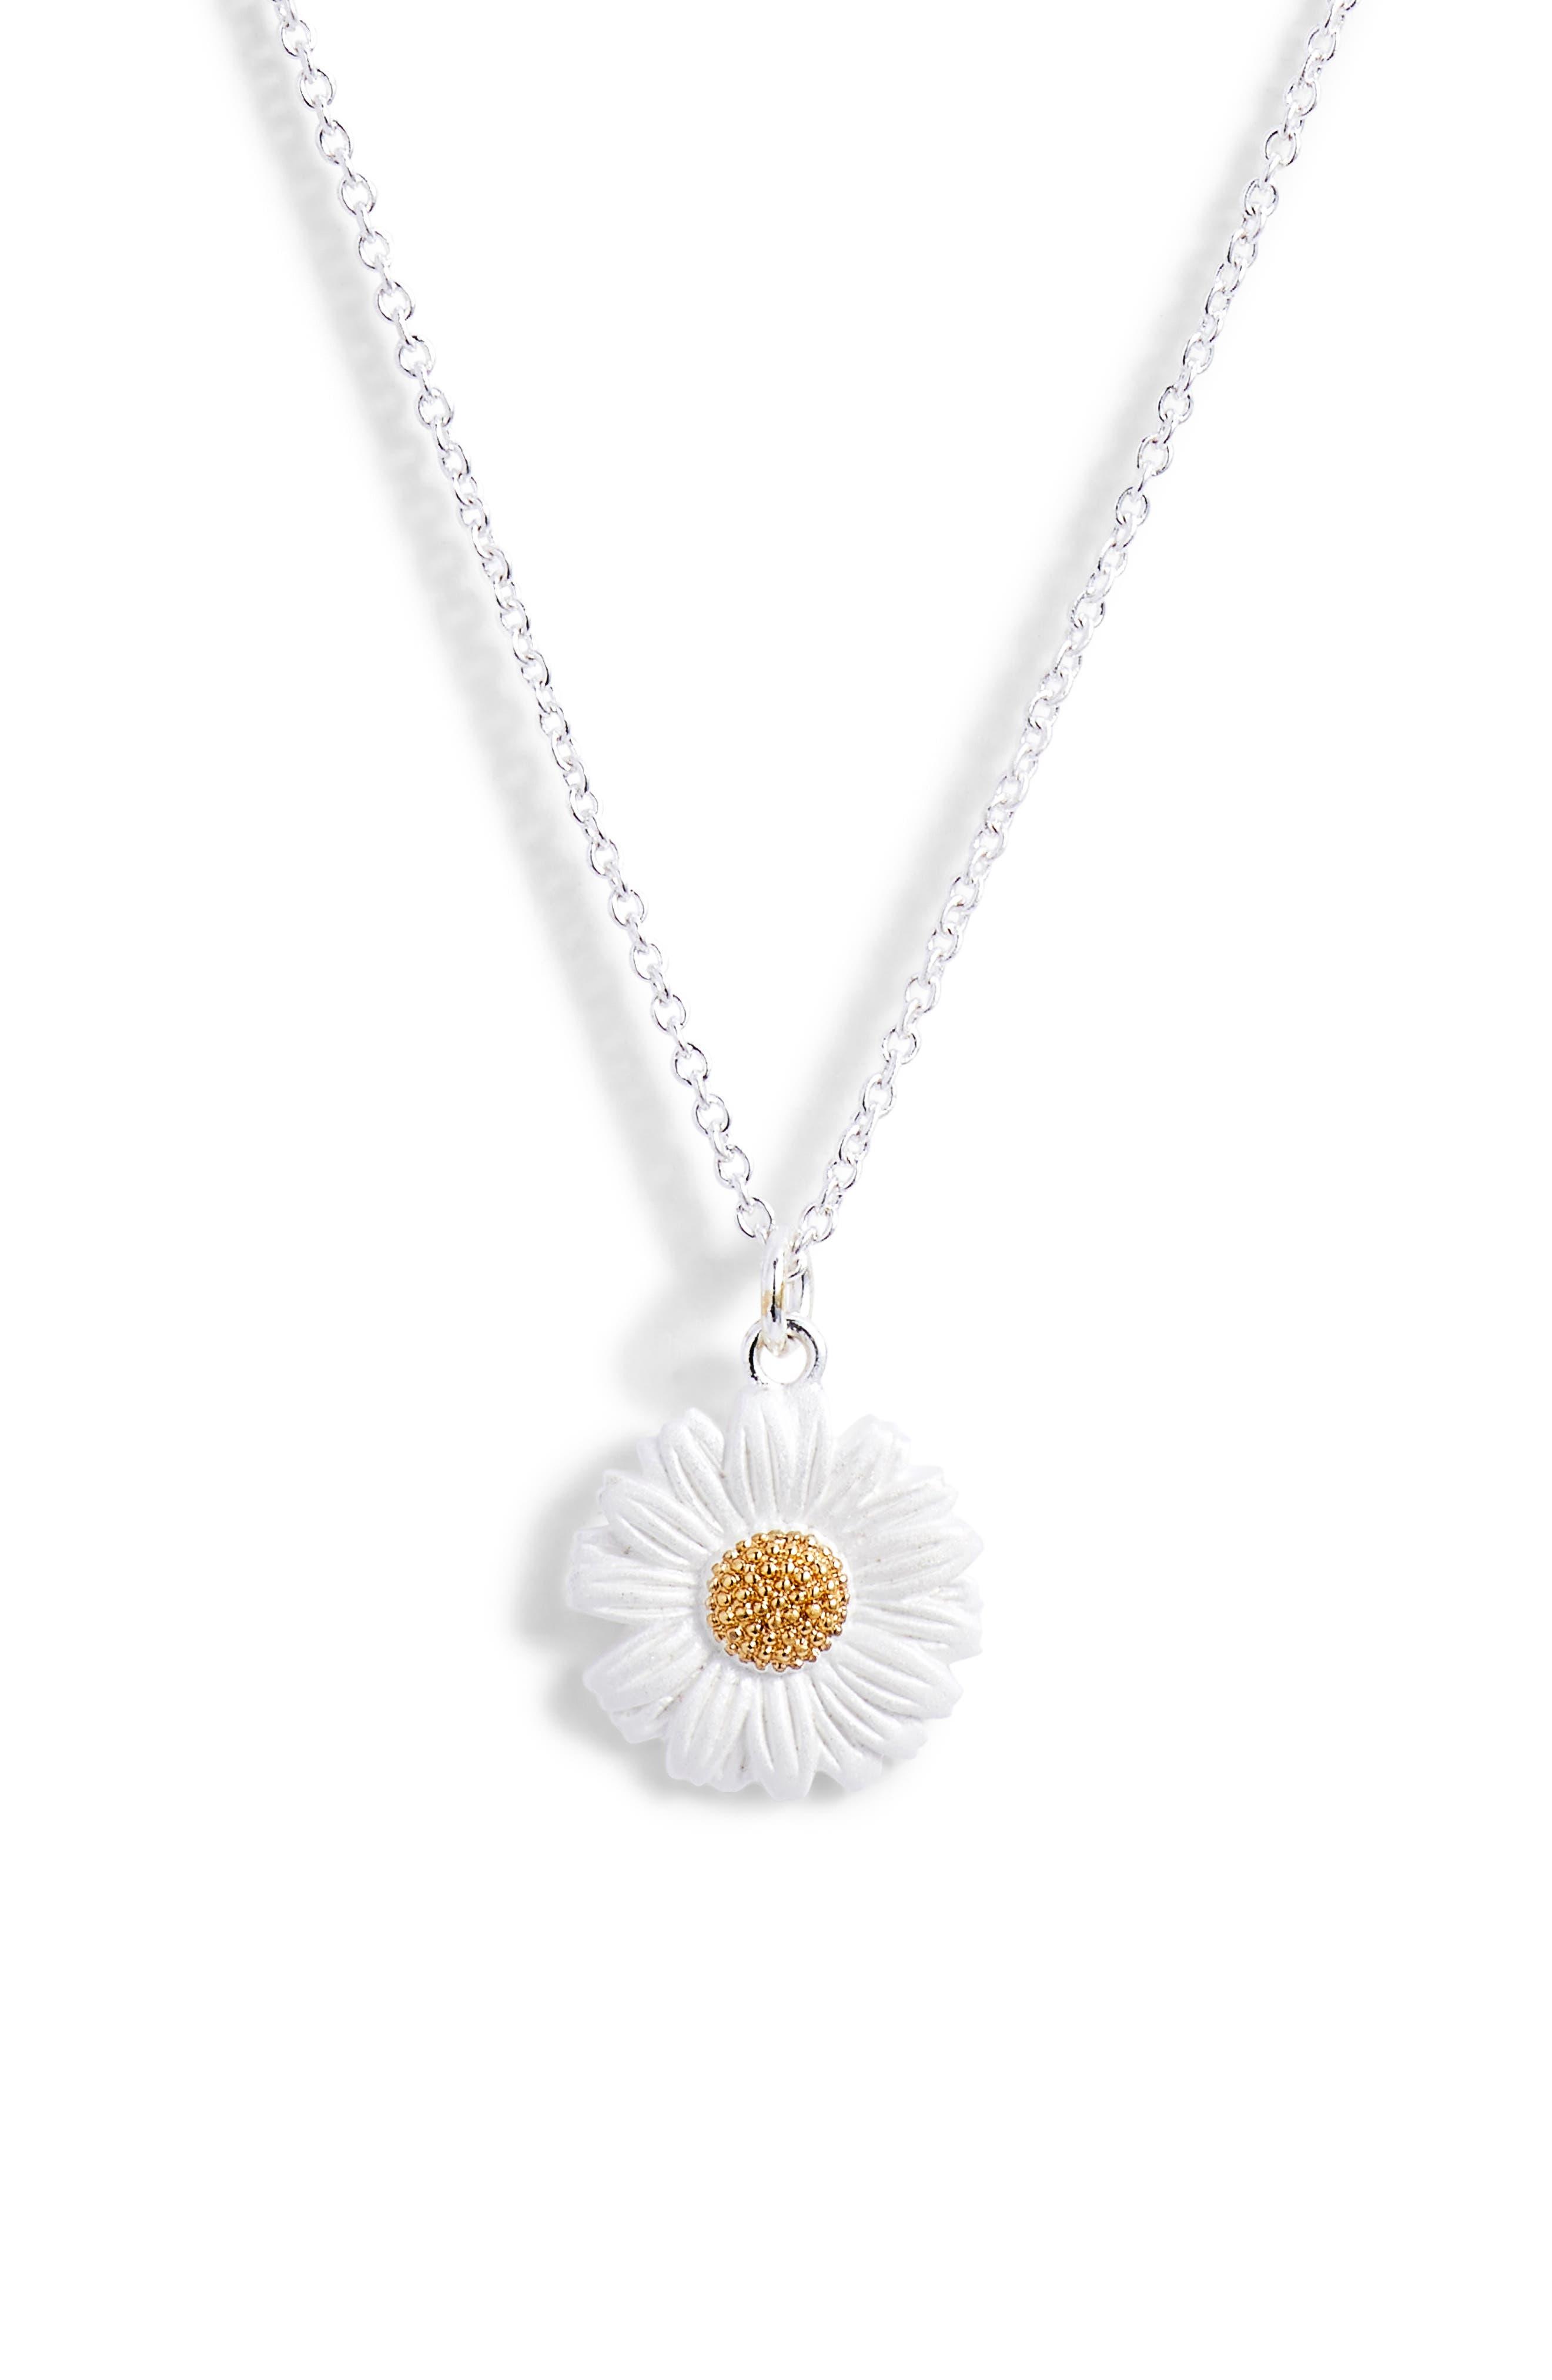 3D Daisy Pendant Necklace,                         Main,                         color, SILVER/ GOLD